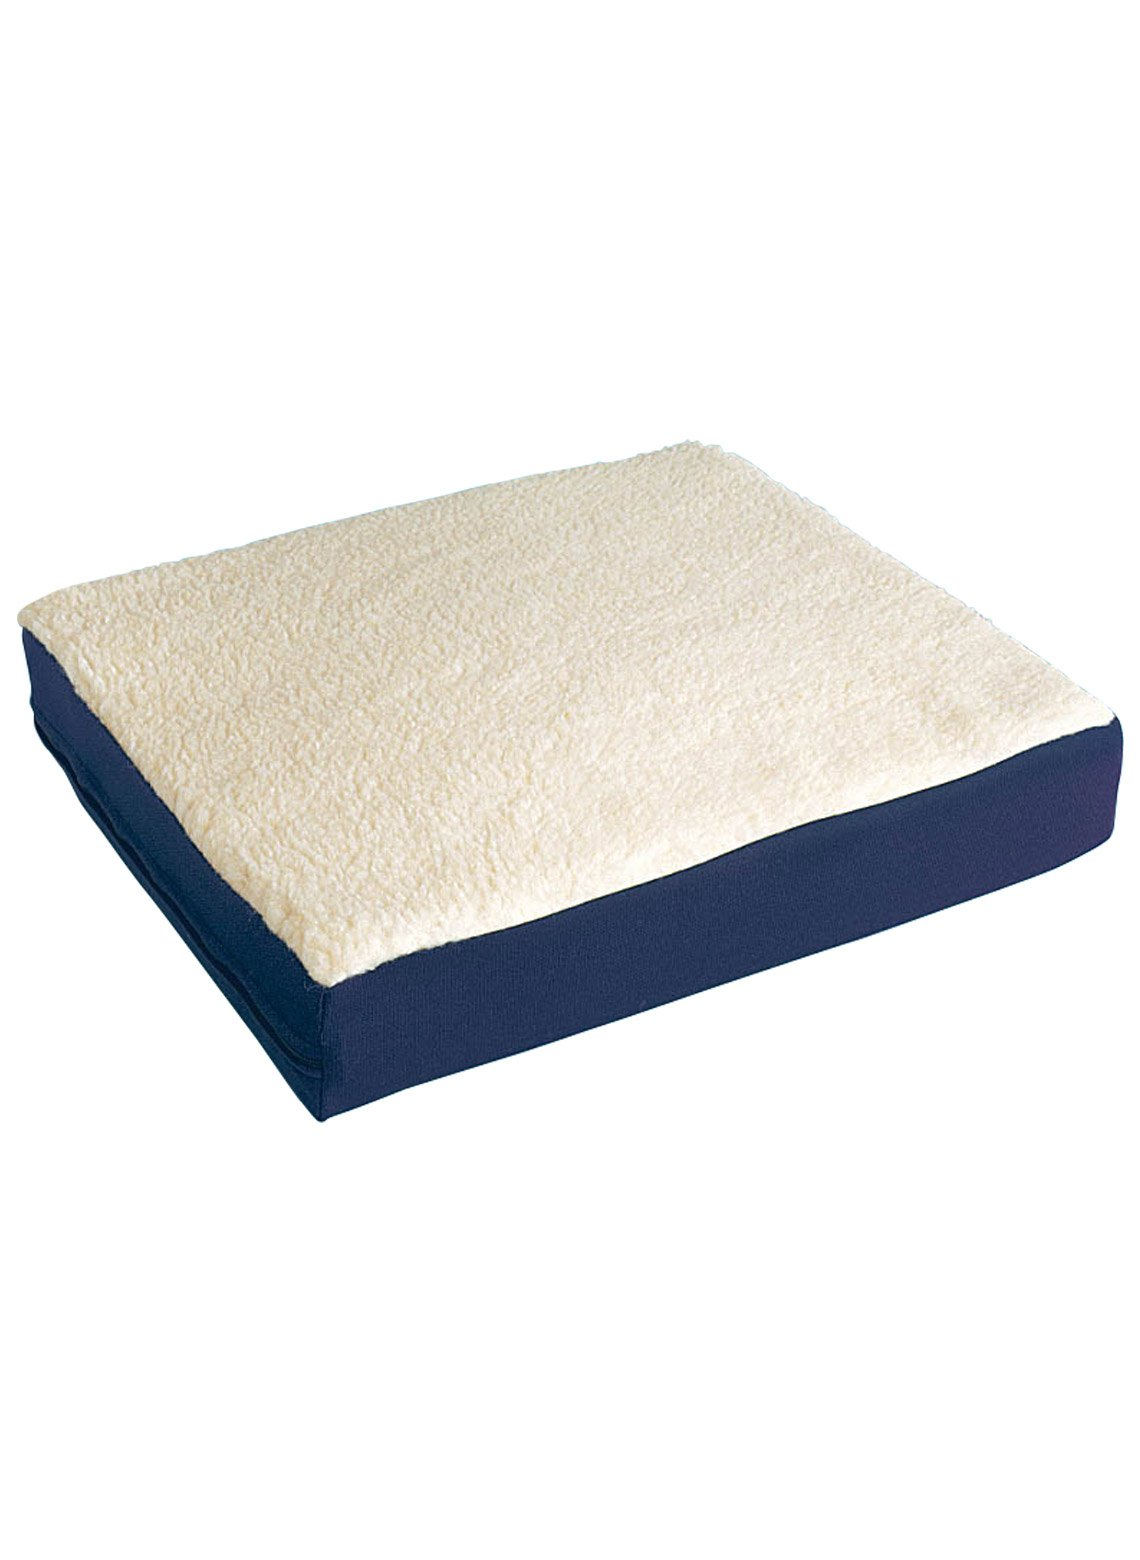 Super-Comfortable Gel Cushion